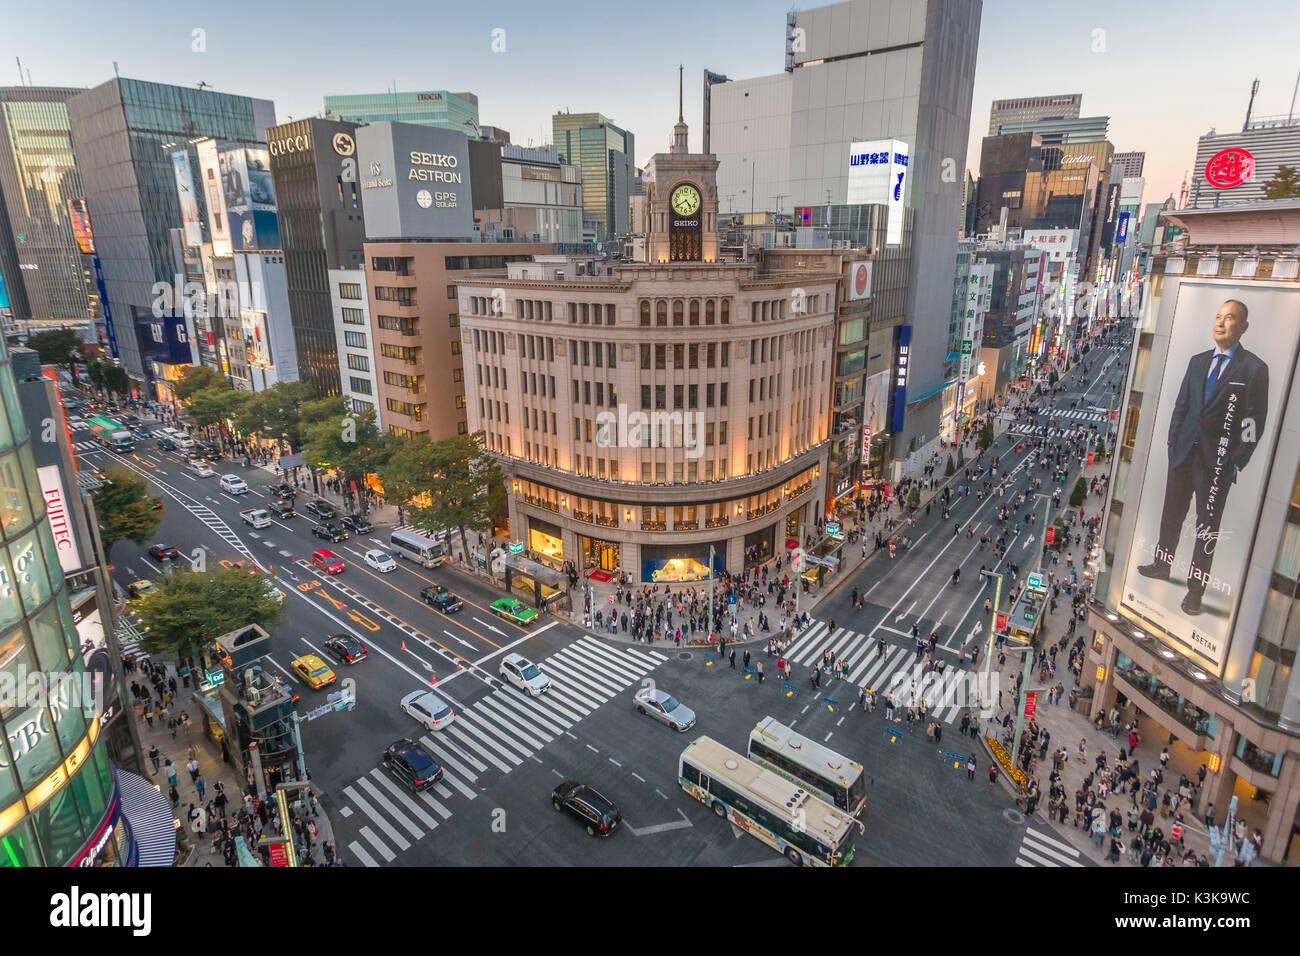 Japan, Tokyo City, Ginza Area, Harumi and Chuo Avenues crossing,Wako Bldg. - Stock Image